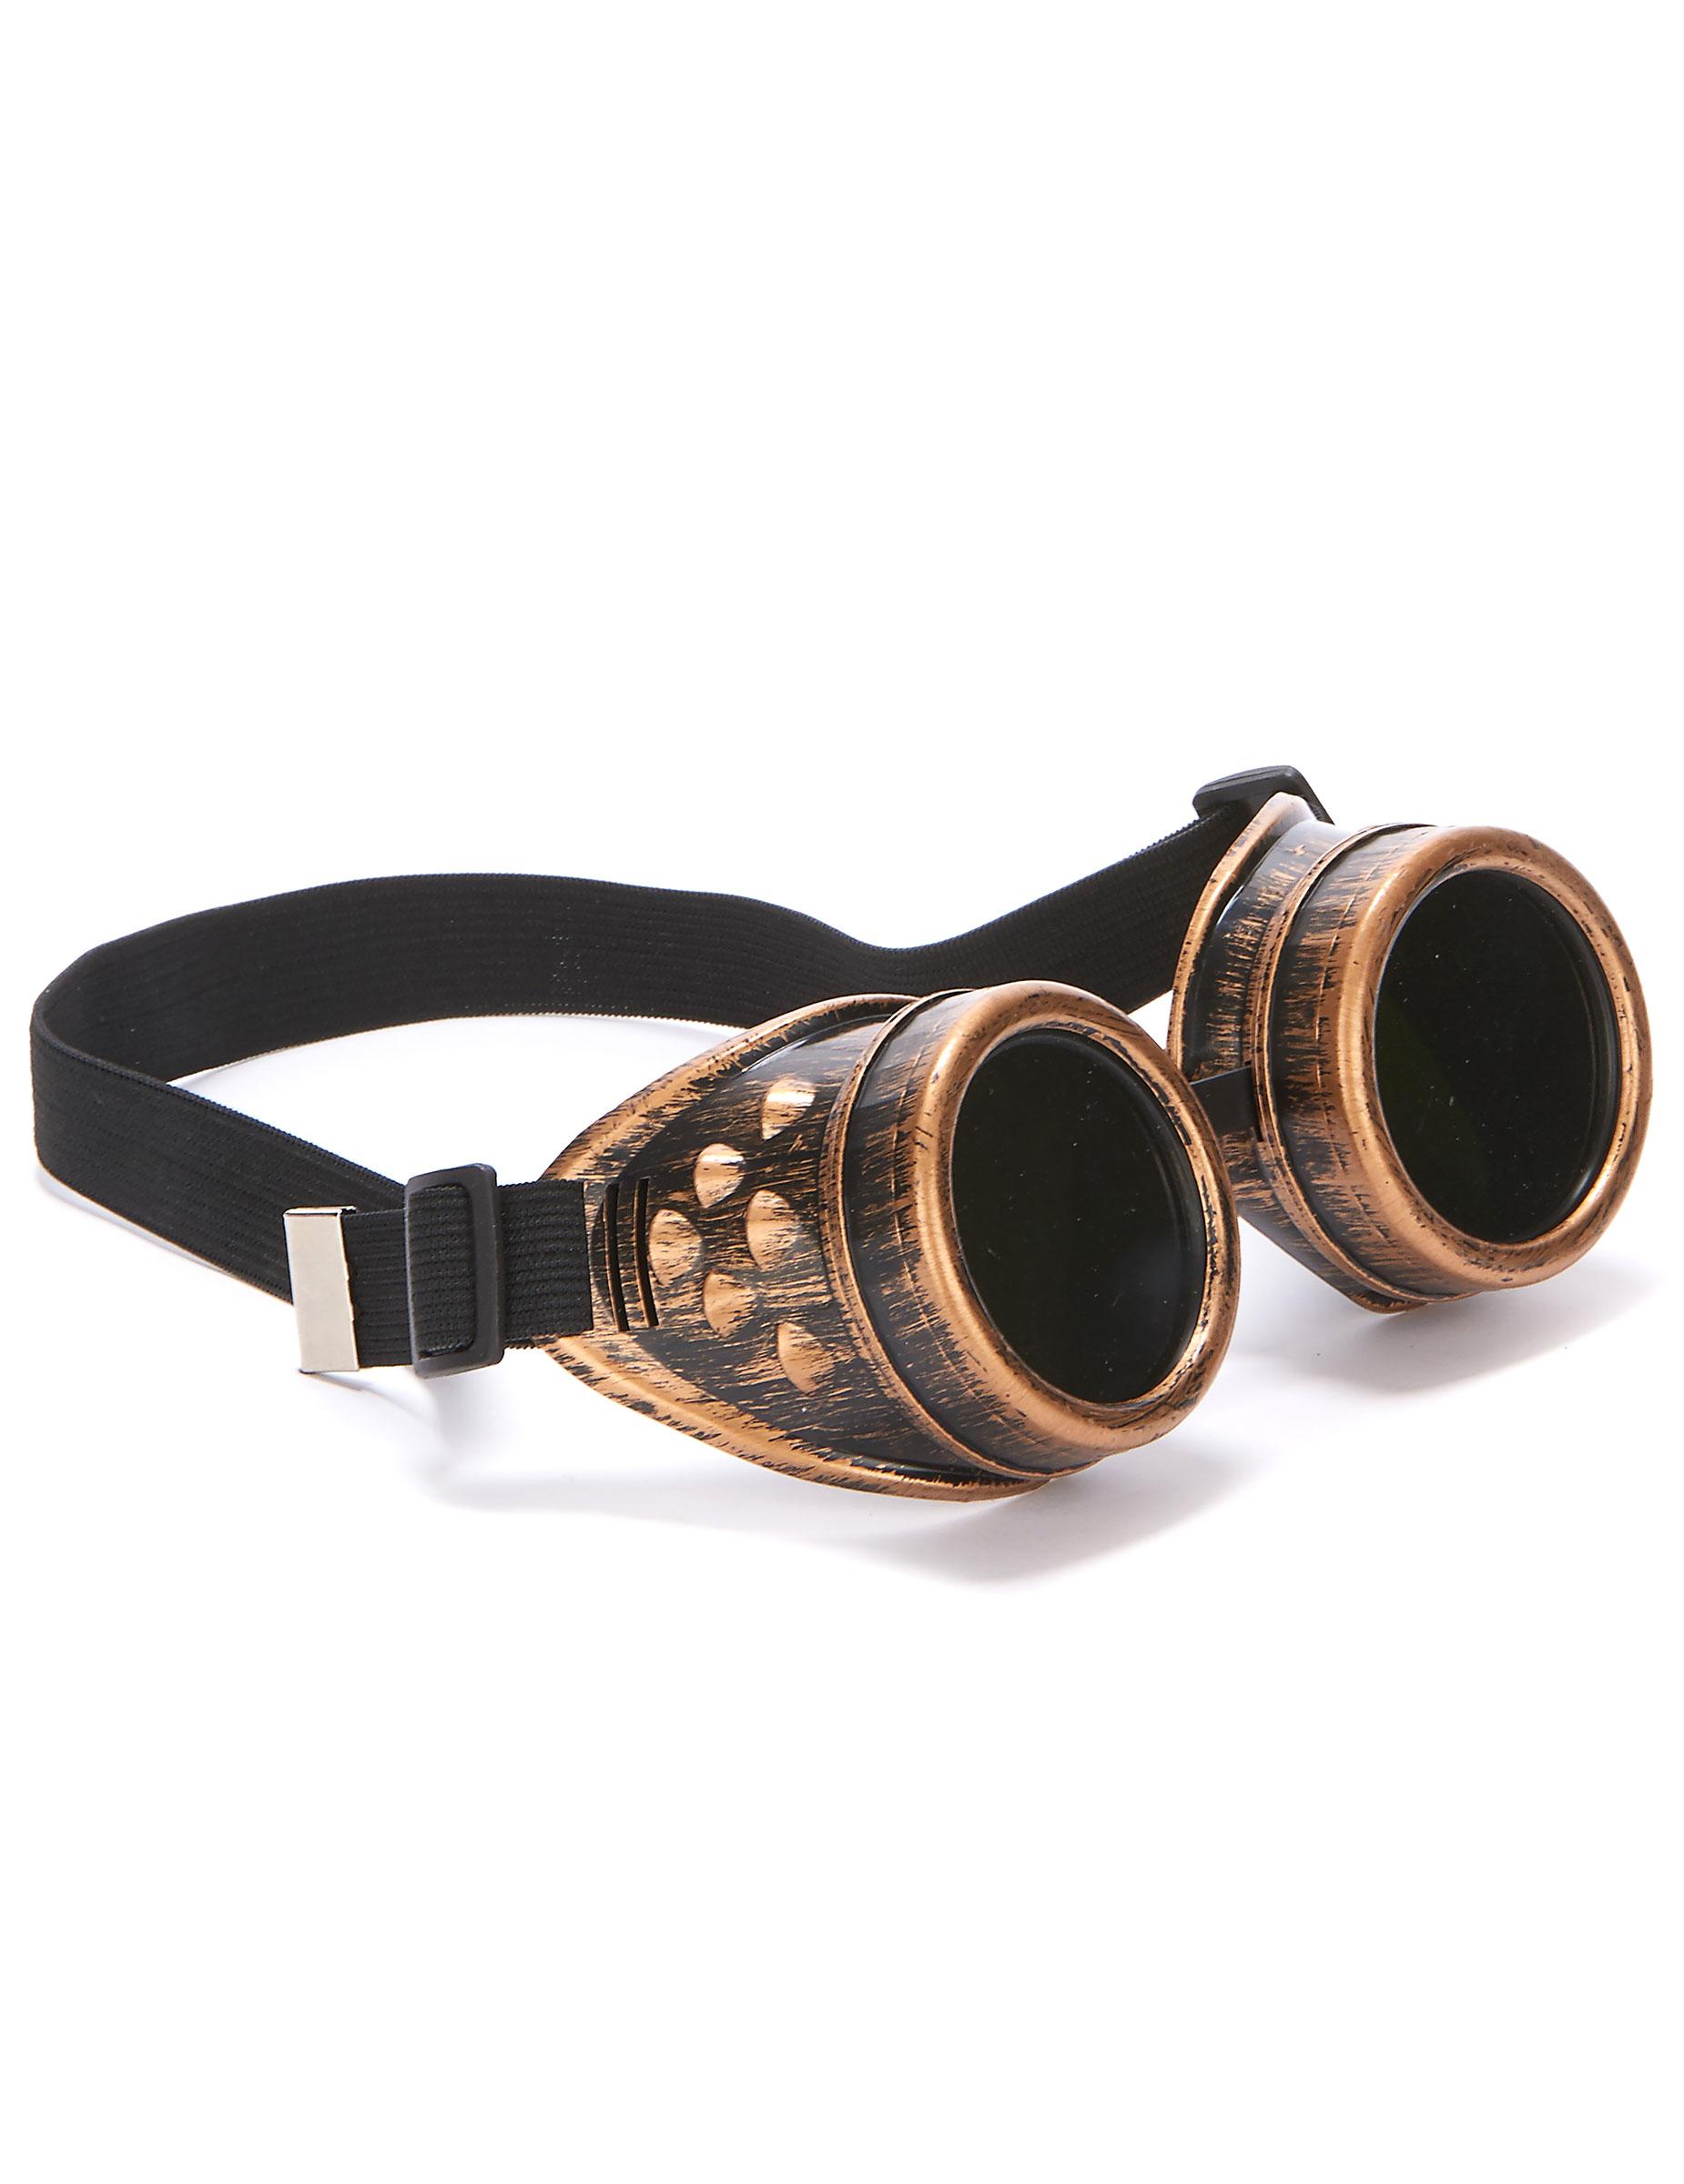 bd06c5e58 Óculos aviador cobre adulto: Acessórios,mascarilhas e fatos de ...